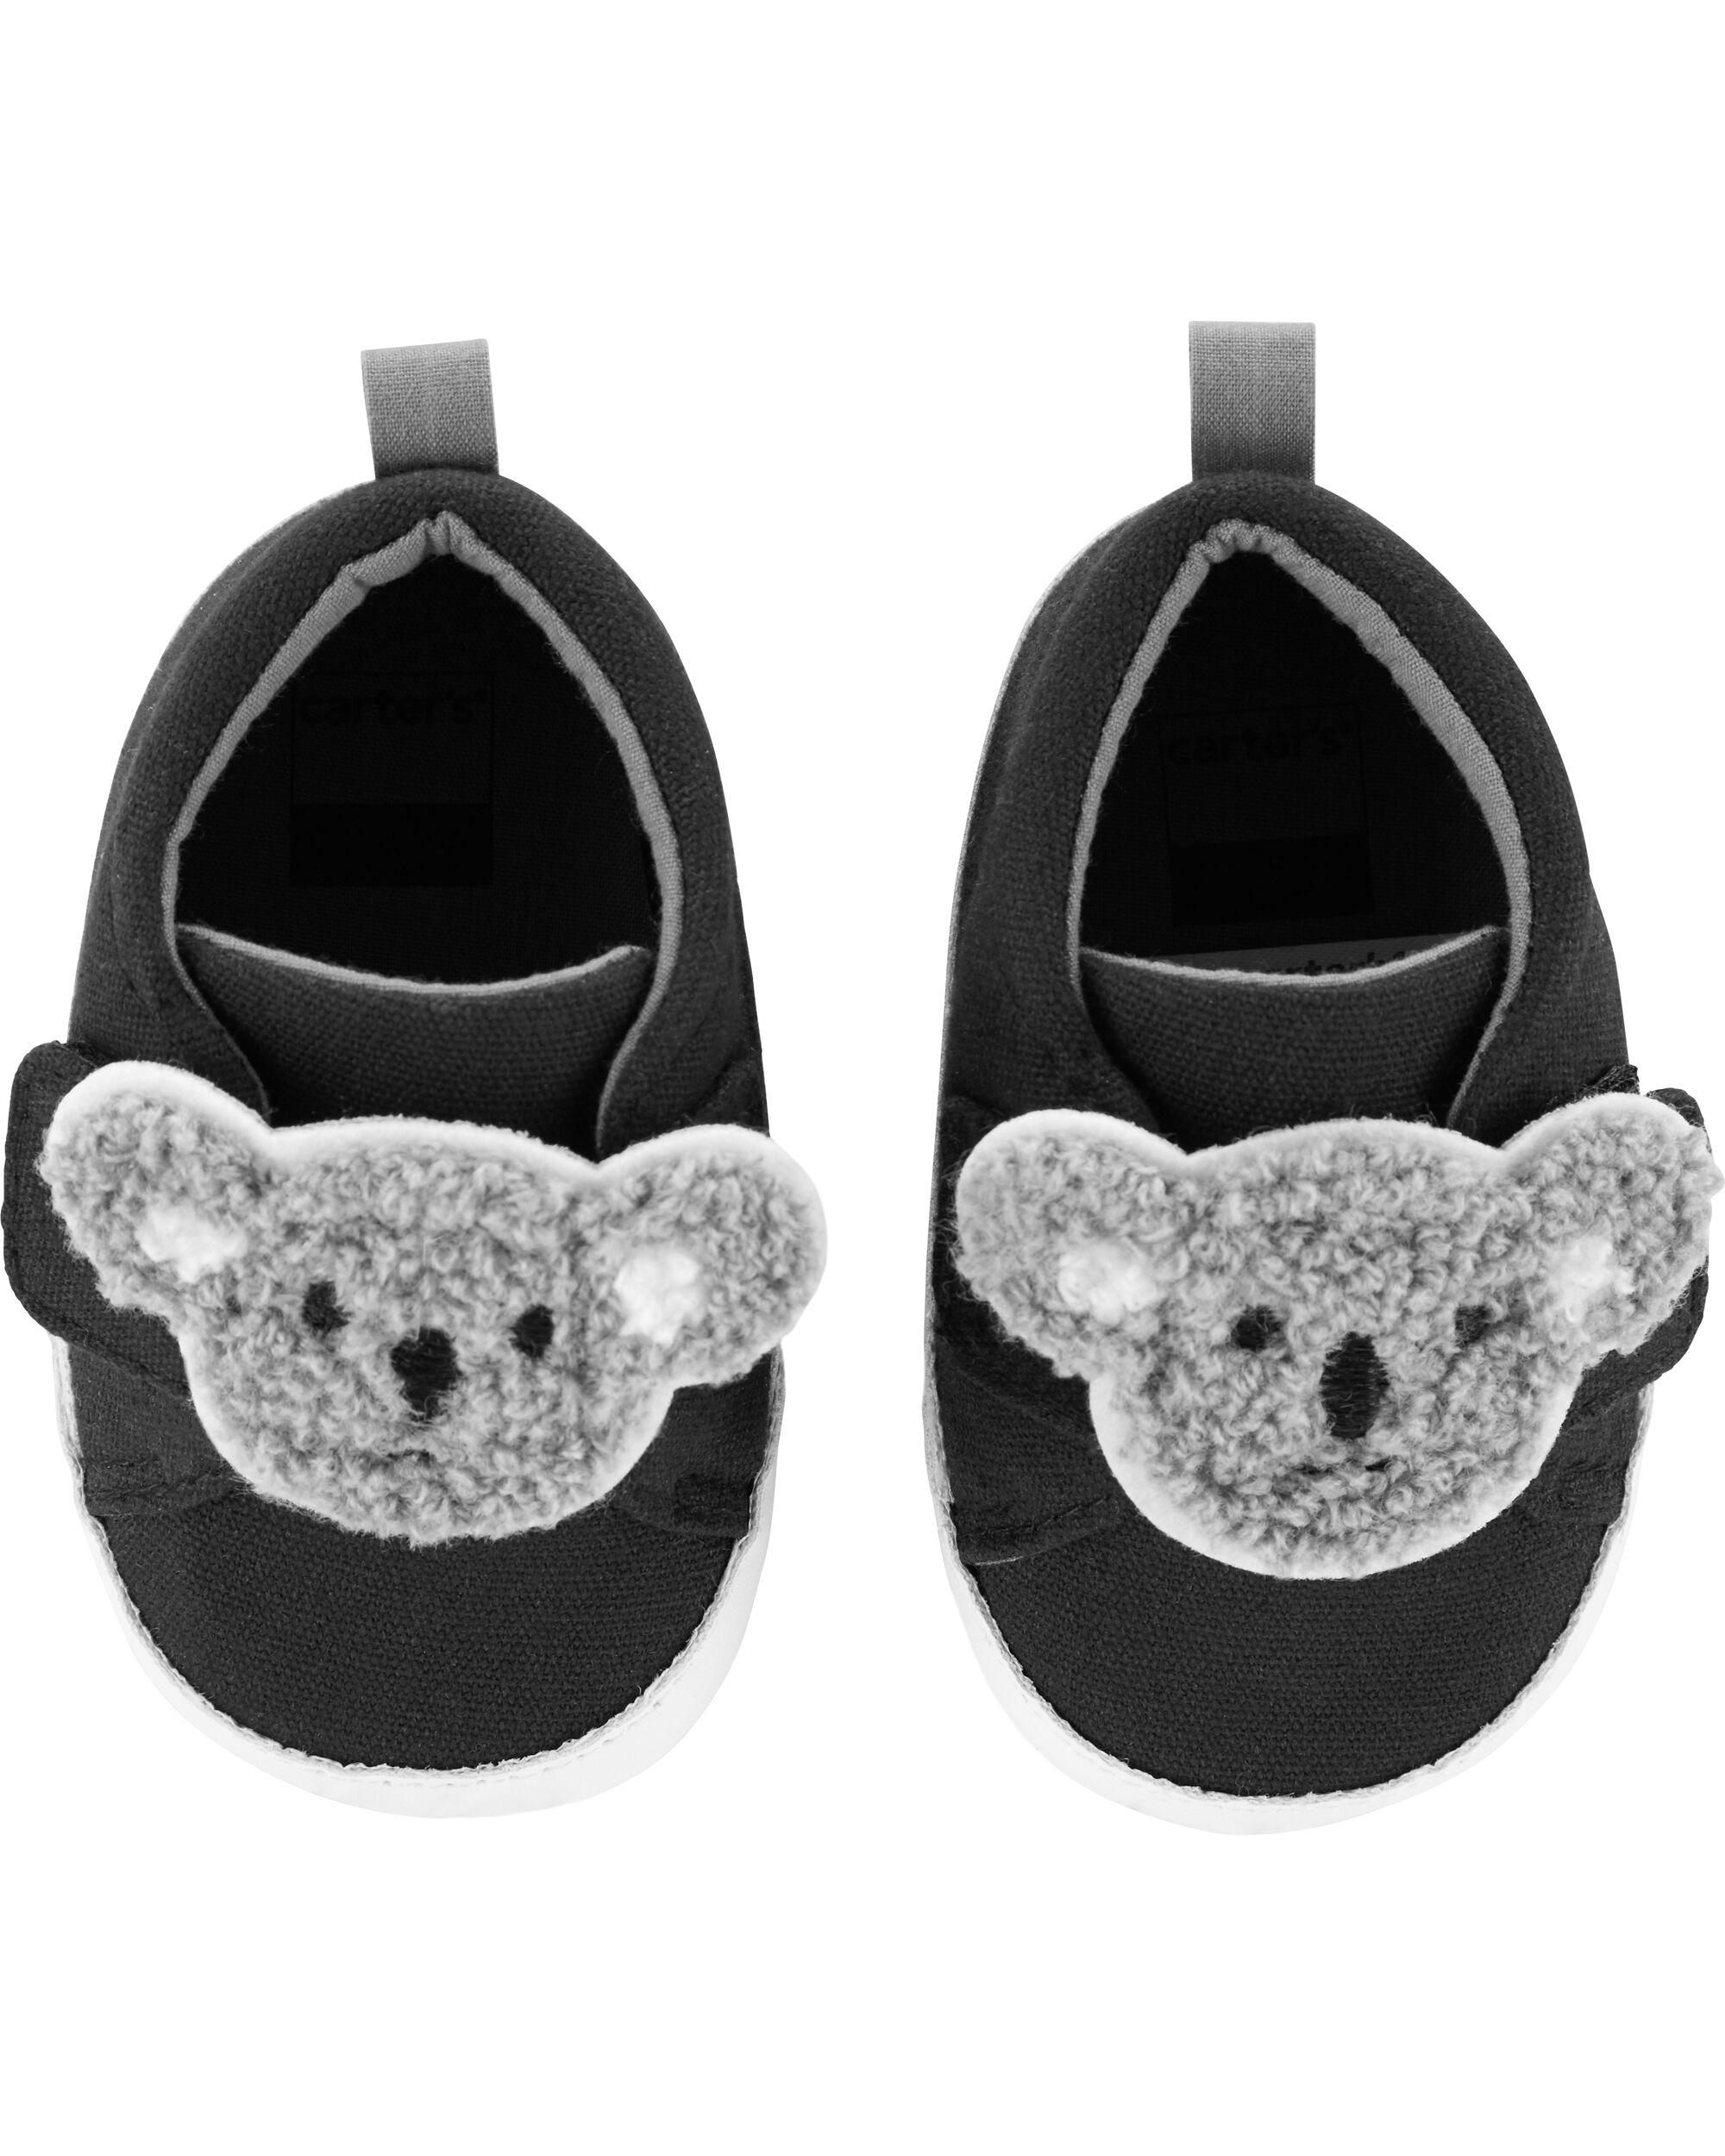 Carter's Koala Baby Shoes | carters.com